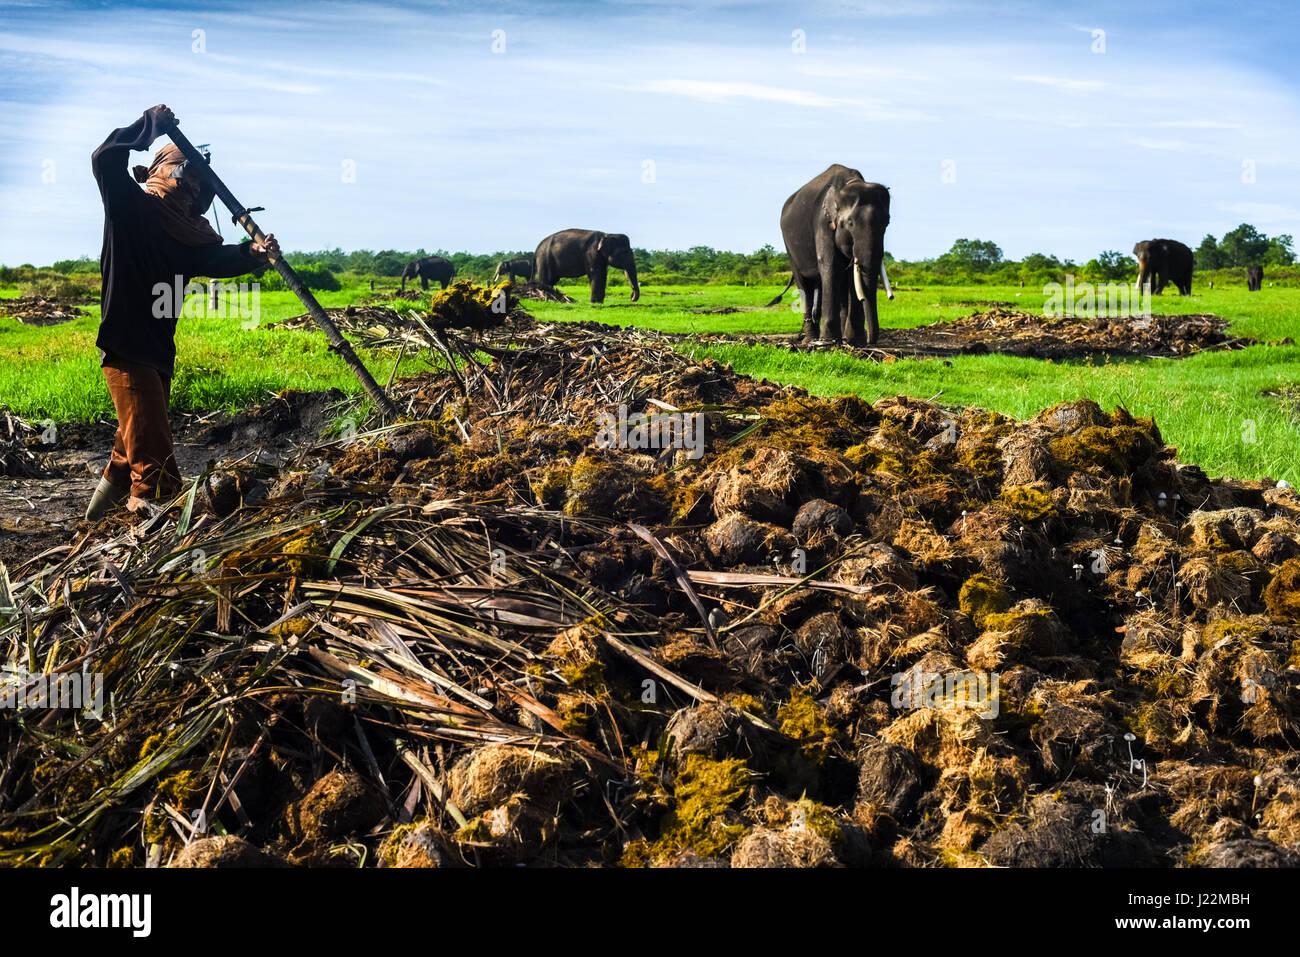 Ein Arbeiter aufräumen Elefantendung im Weg Missions-Nationalpark, Sumatra, Indonesien. © Reynold Sumayku Stockbild